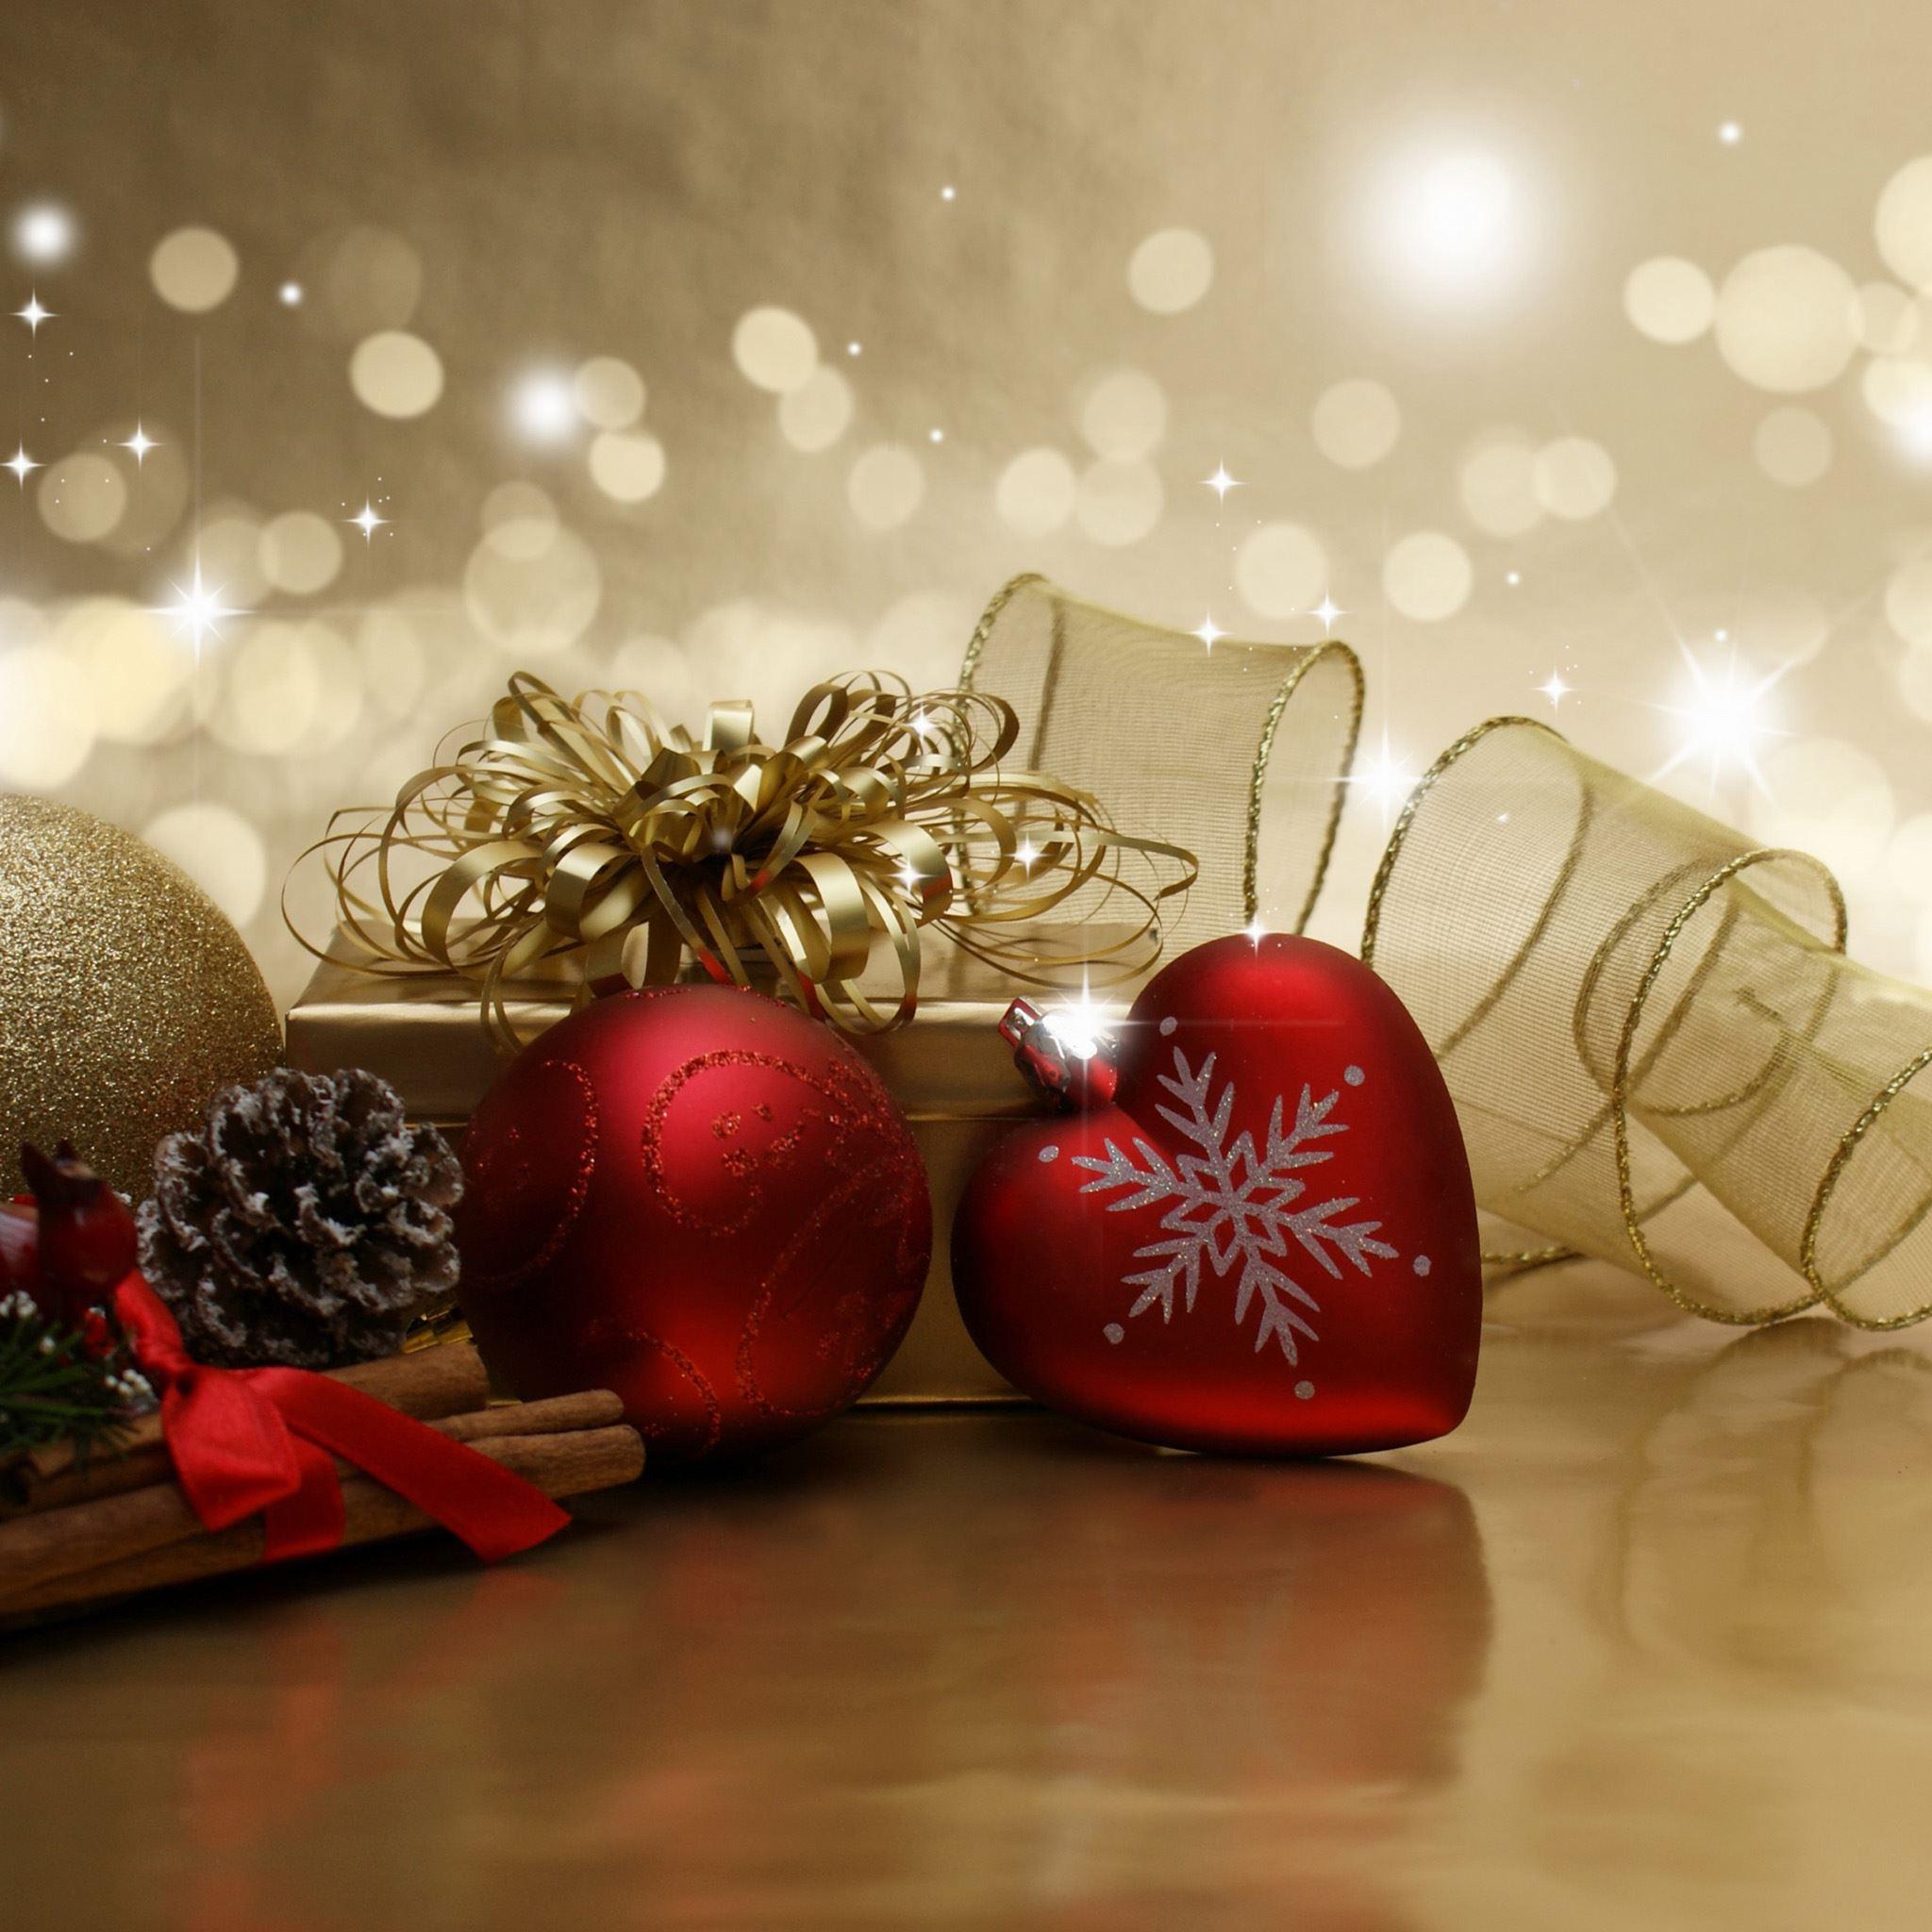 Christmas Love IPad Air Wallpapers Free Download